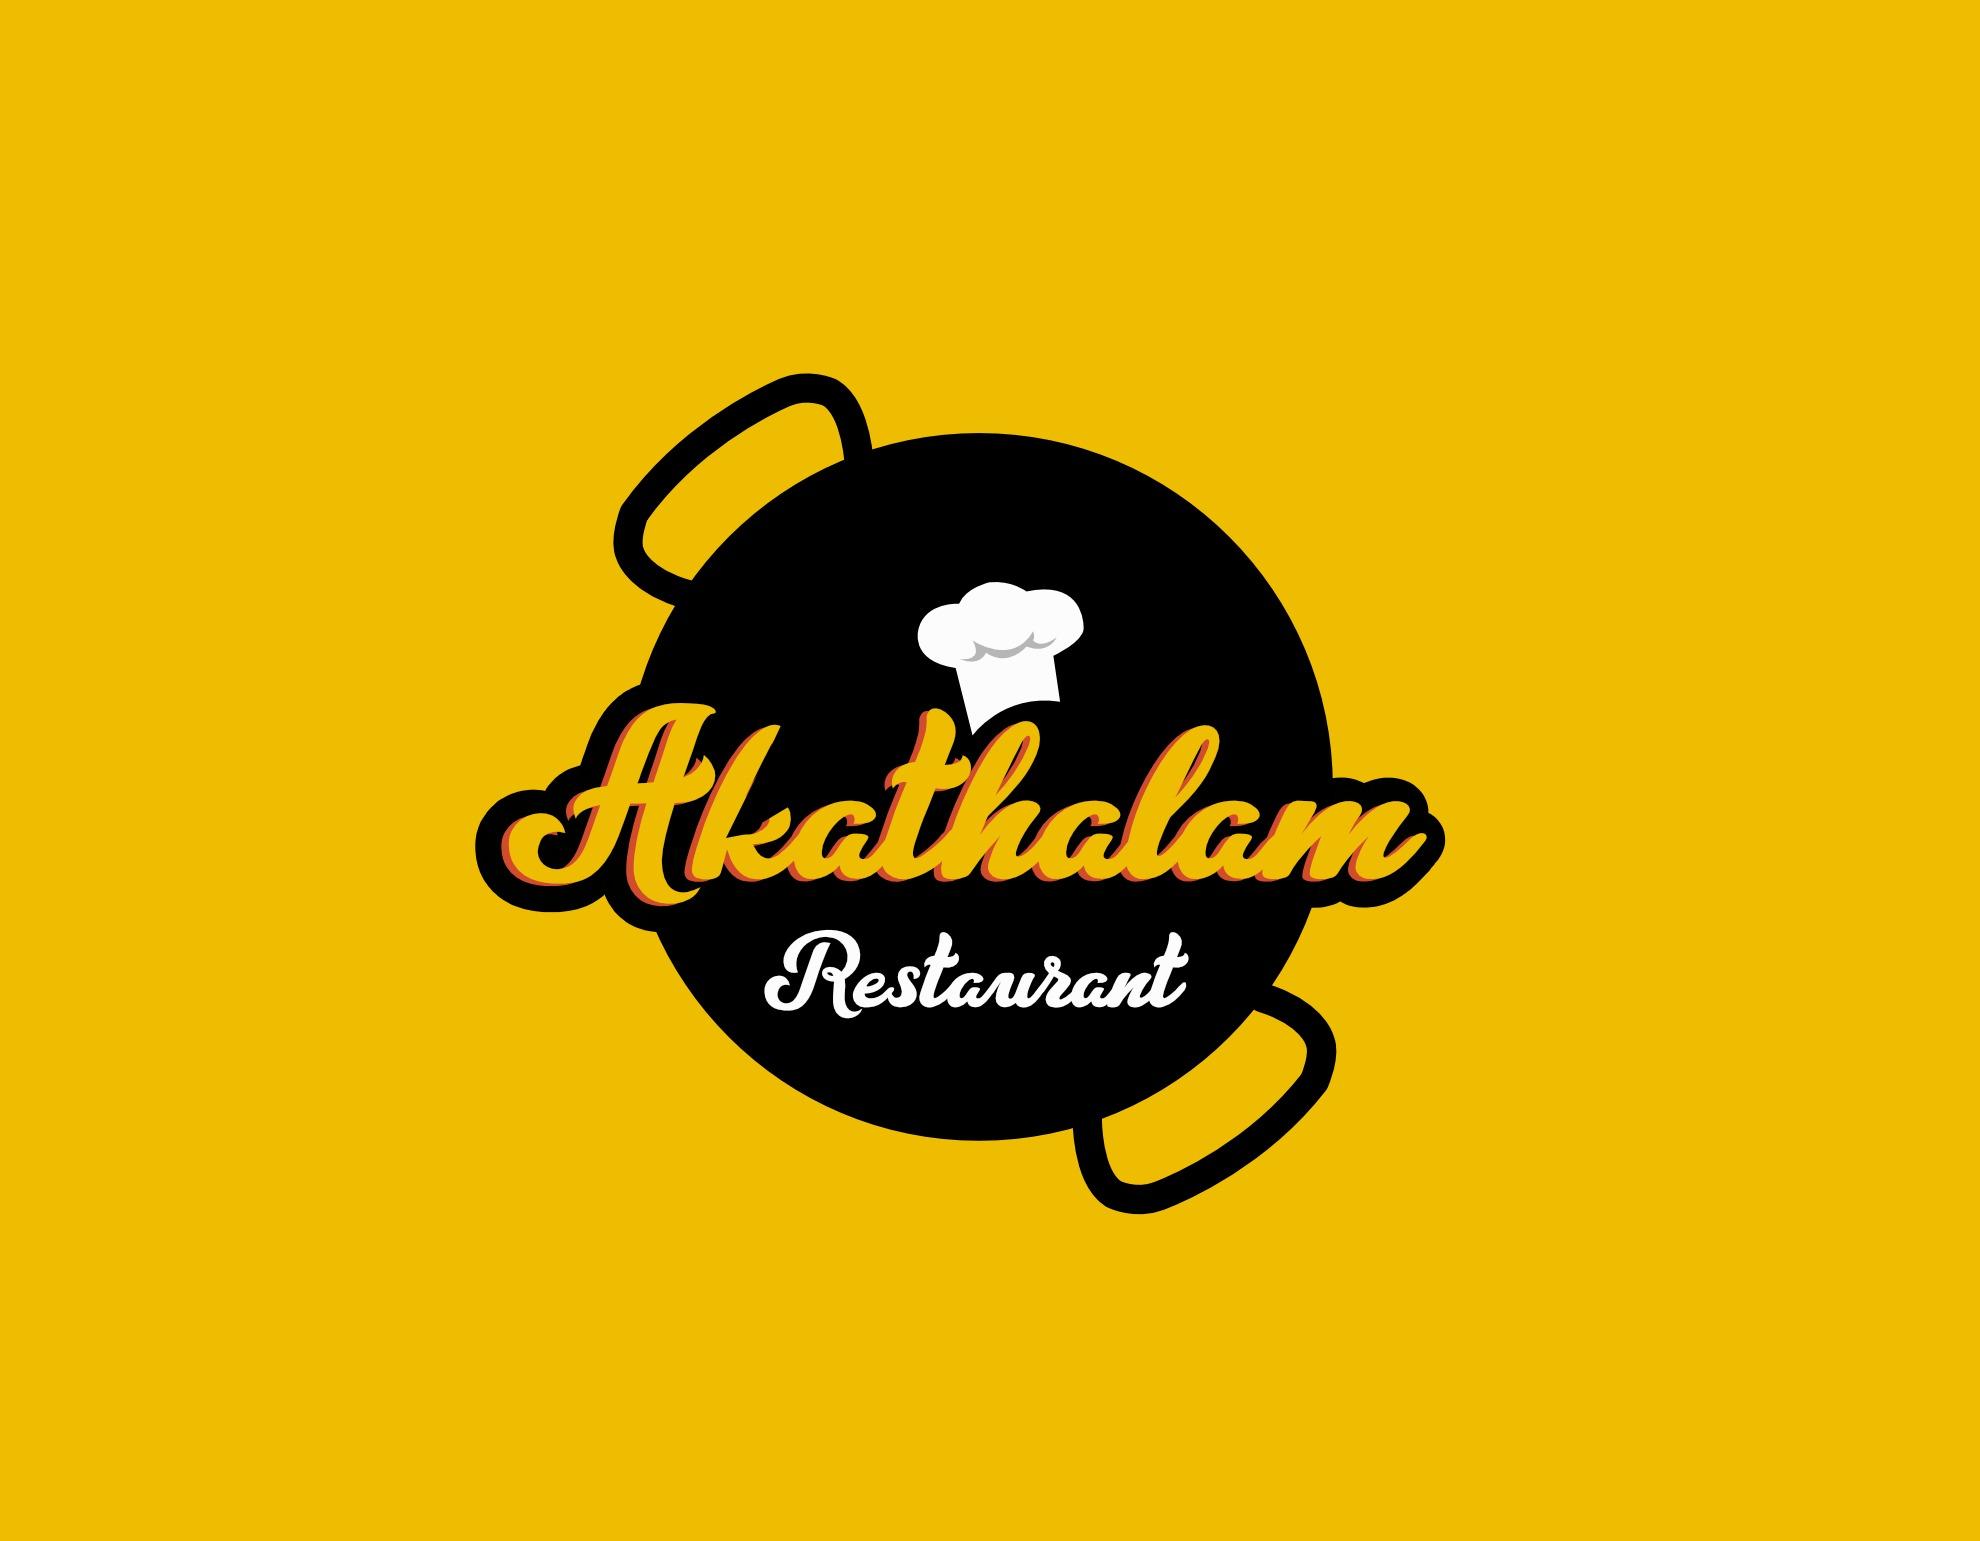 /var/www/html/wp-content/uploads/2018/09/Akathalam3